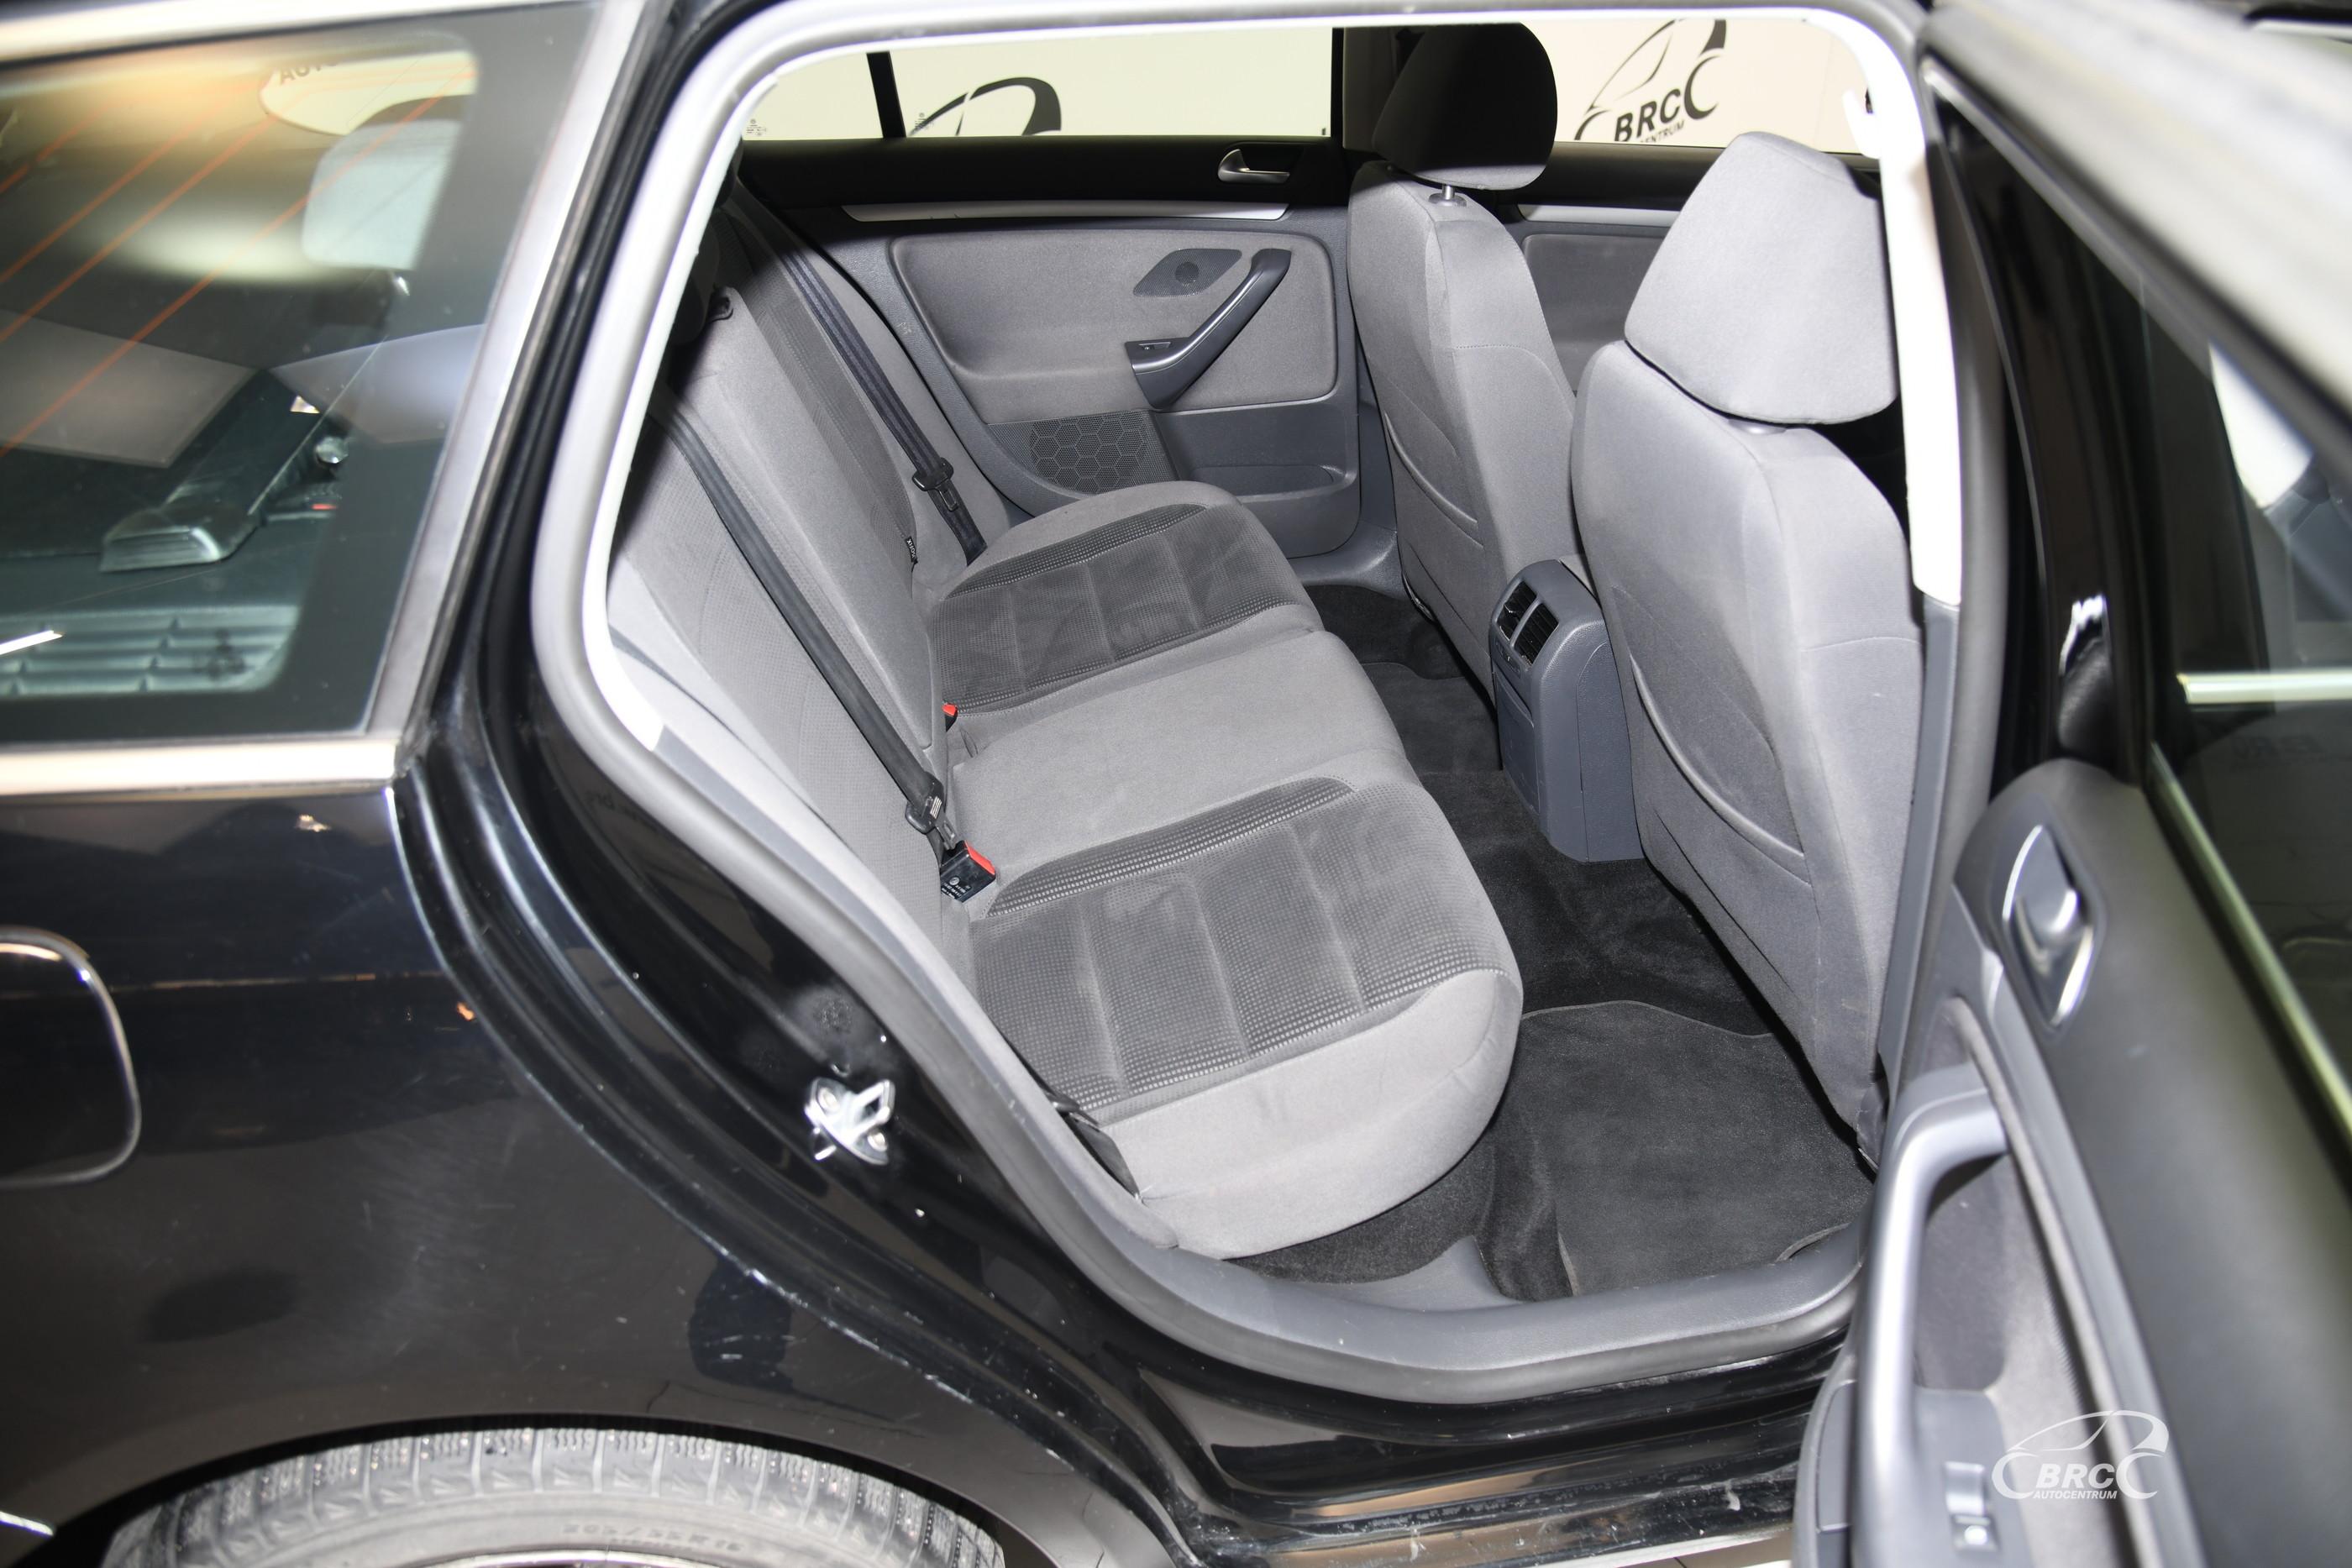 Volkswagen Golf 2.0 TDI Variant Automatas